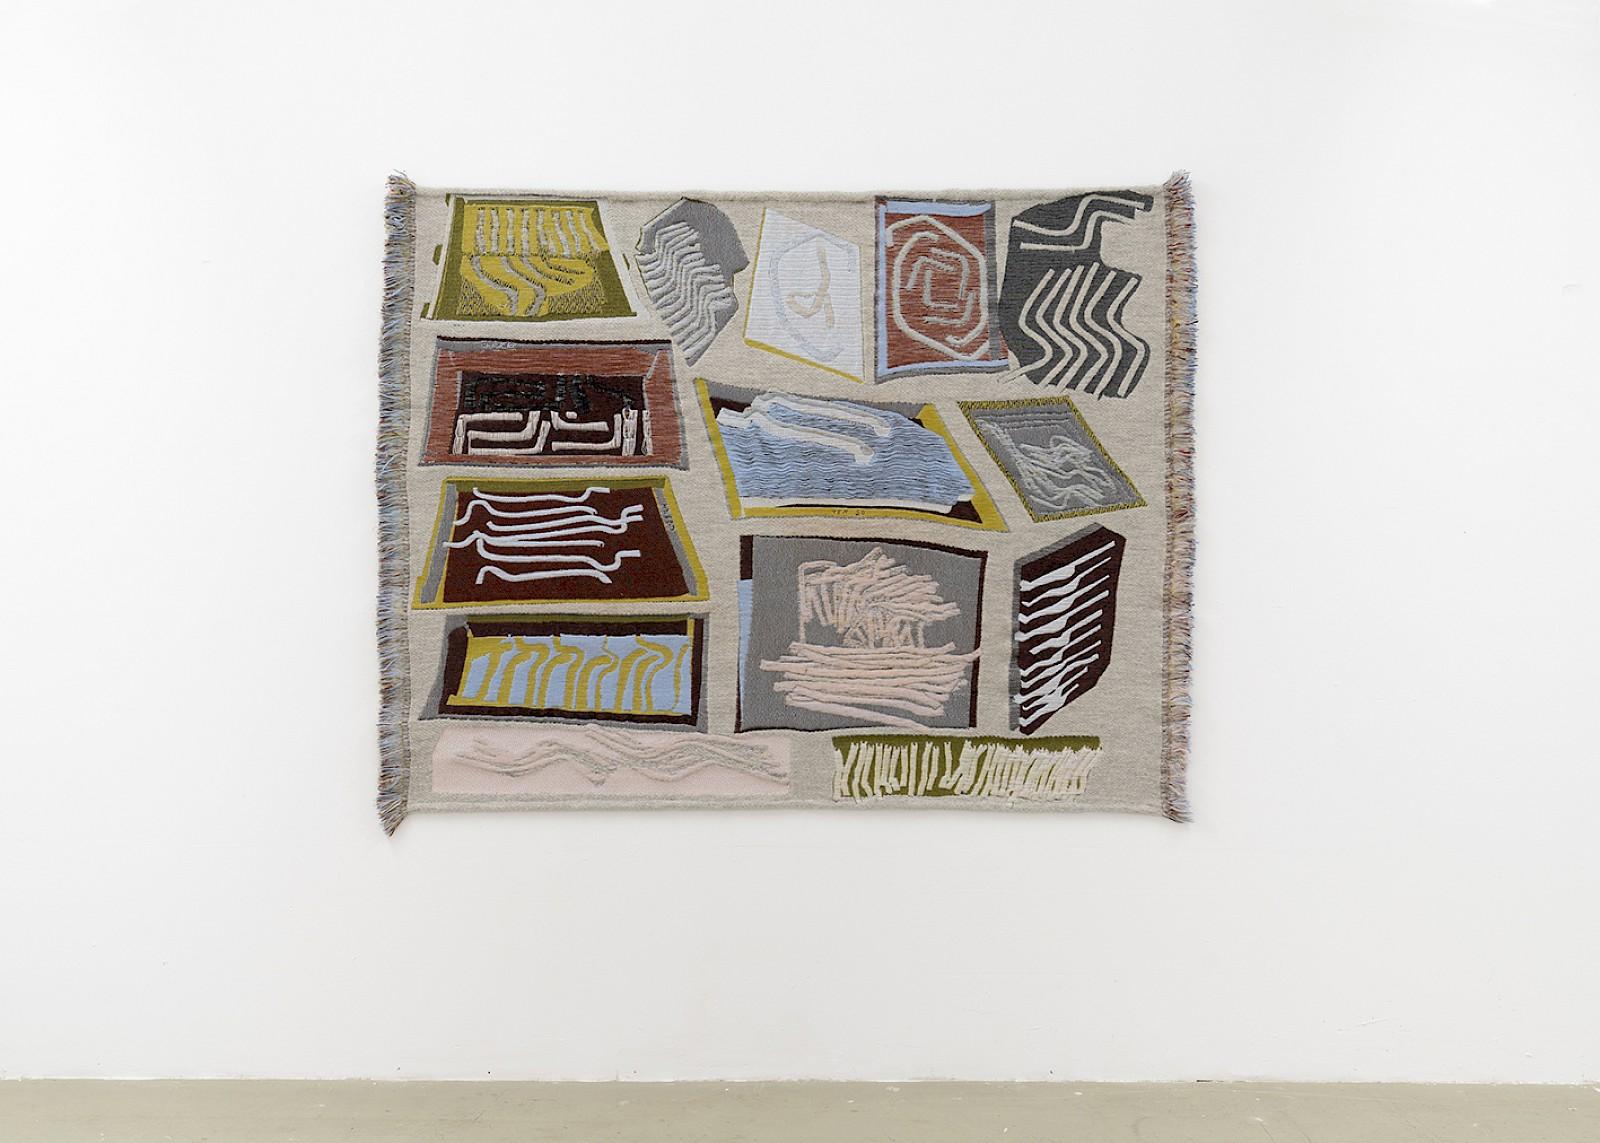 Image - Size: 137 x 175cm, Merino wool, alpaca, linen, lurex, mohair, rubber